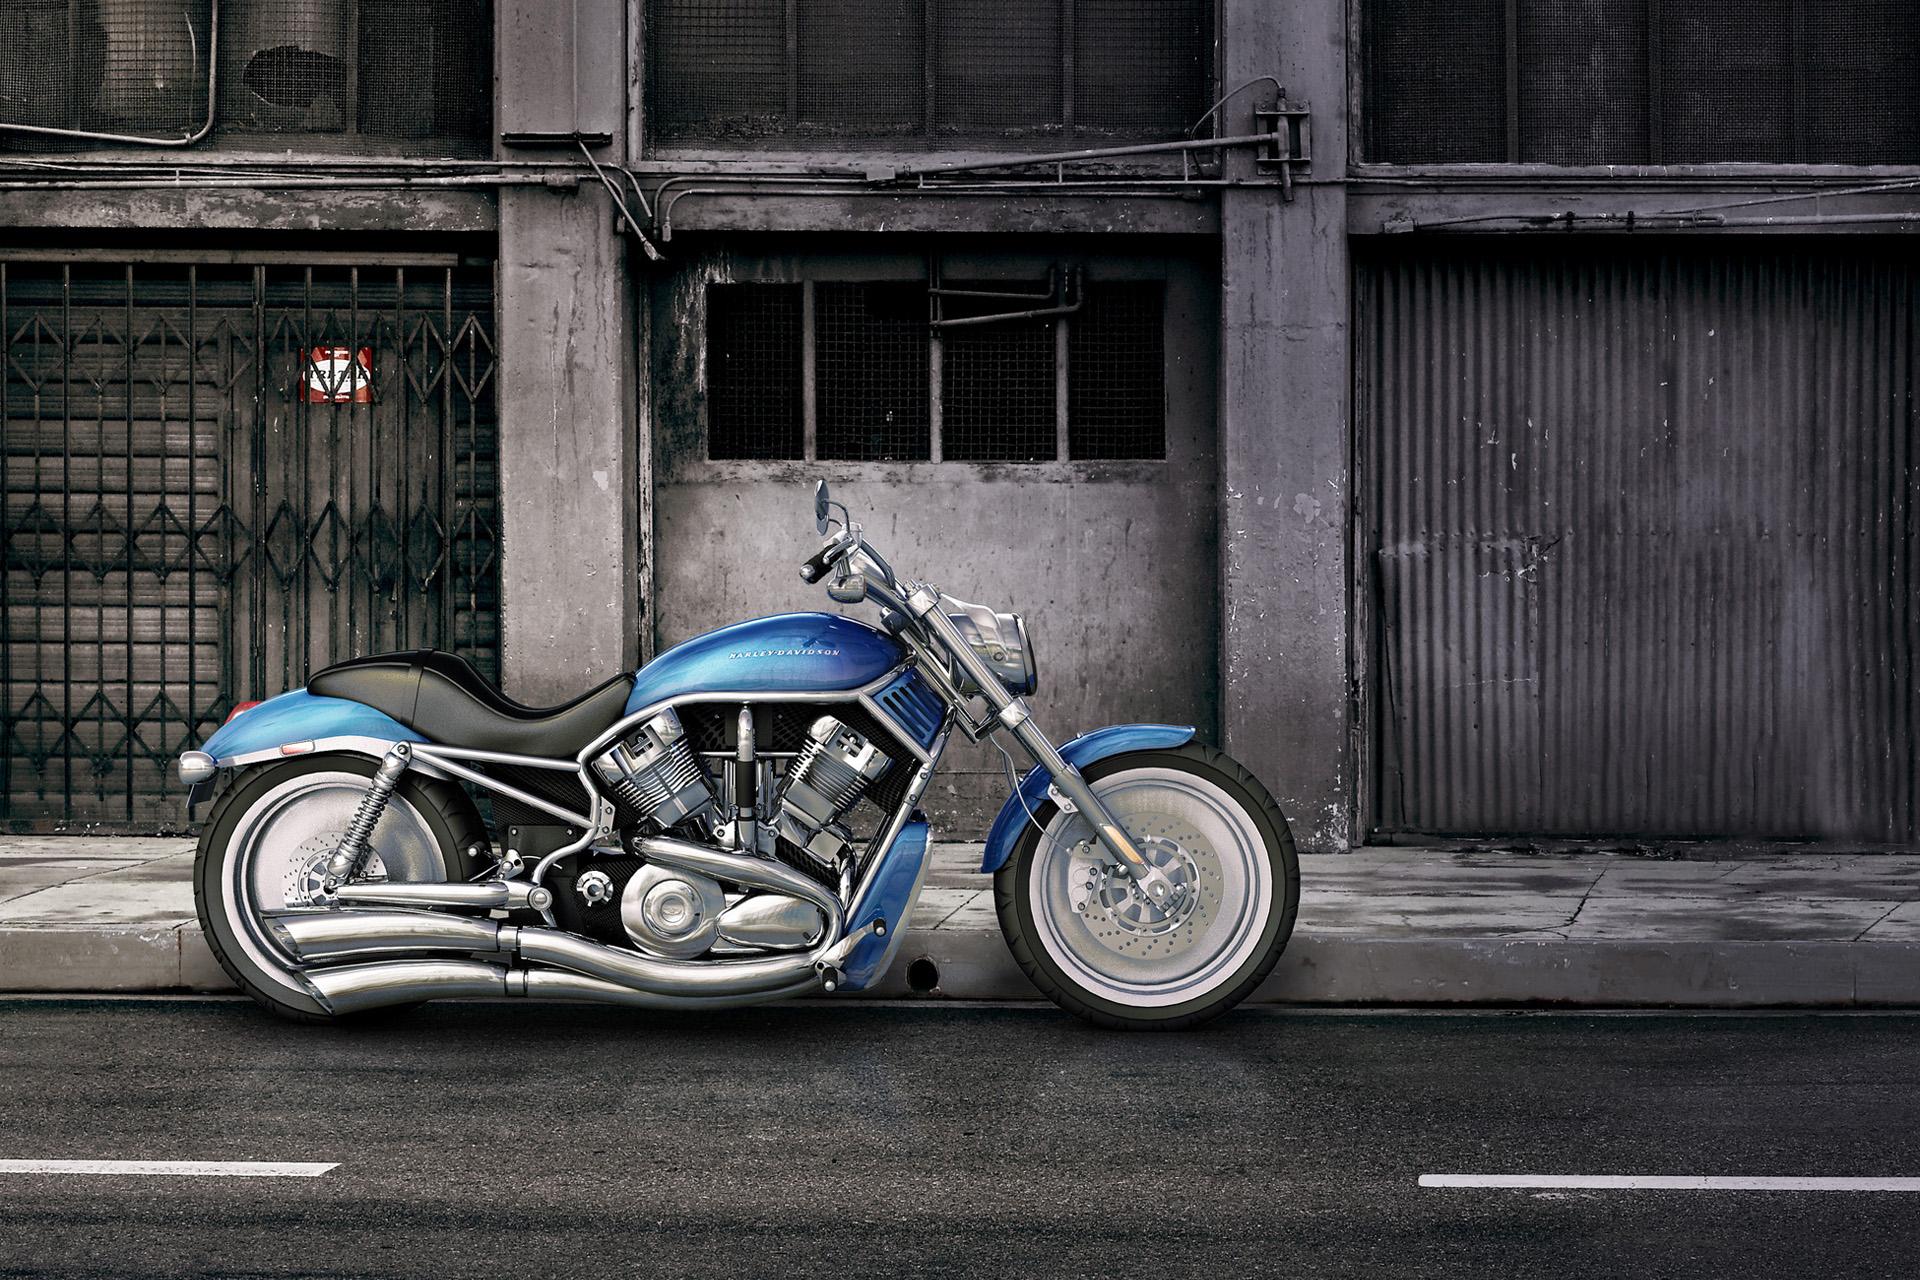 Harley Davidson V Rod Wallpaper 1920x1280 178904 Wallpaperup